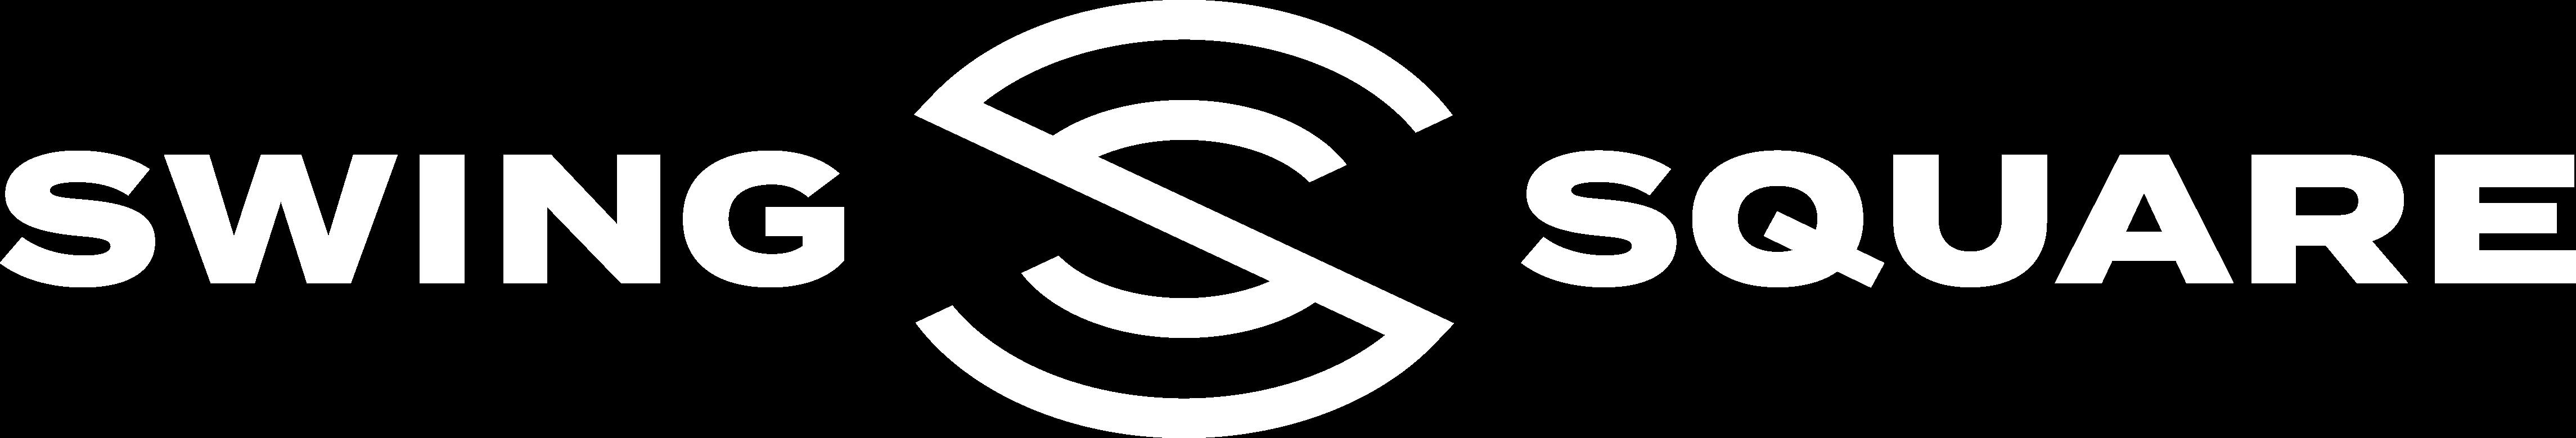 Swing Square - Golf Aid - Branding